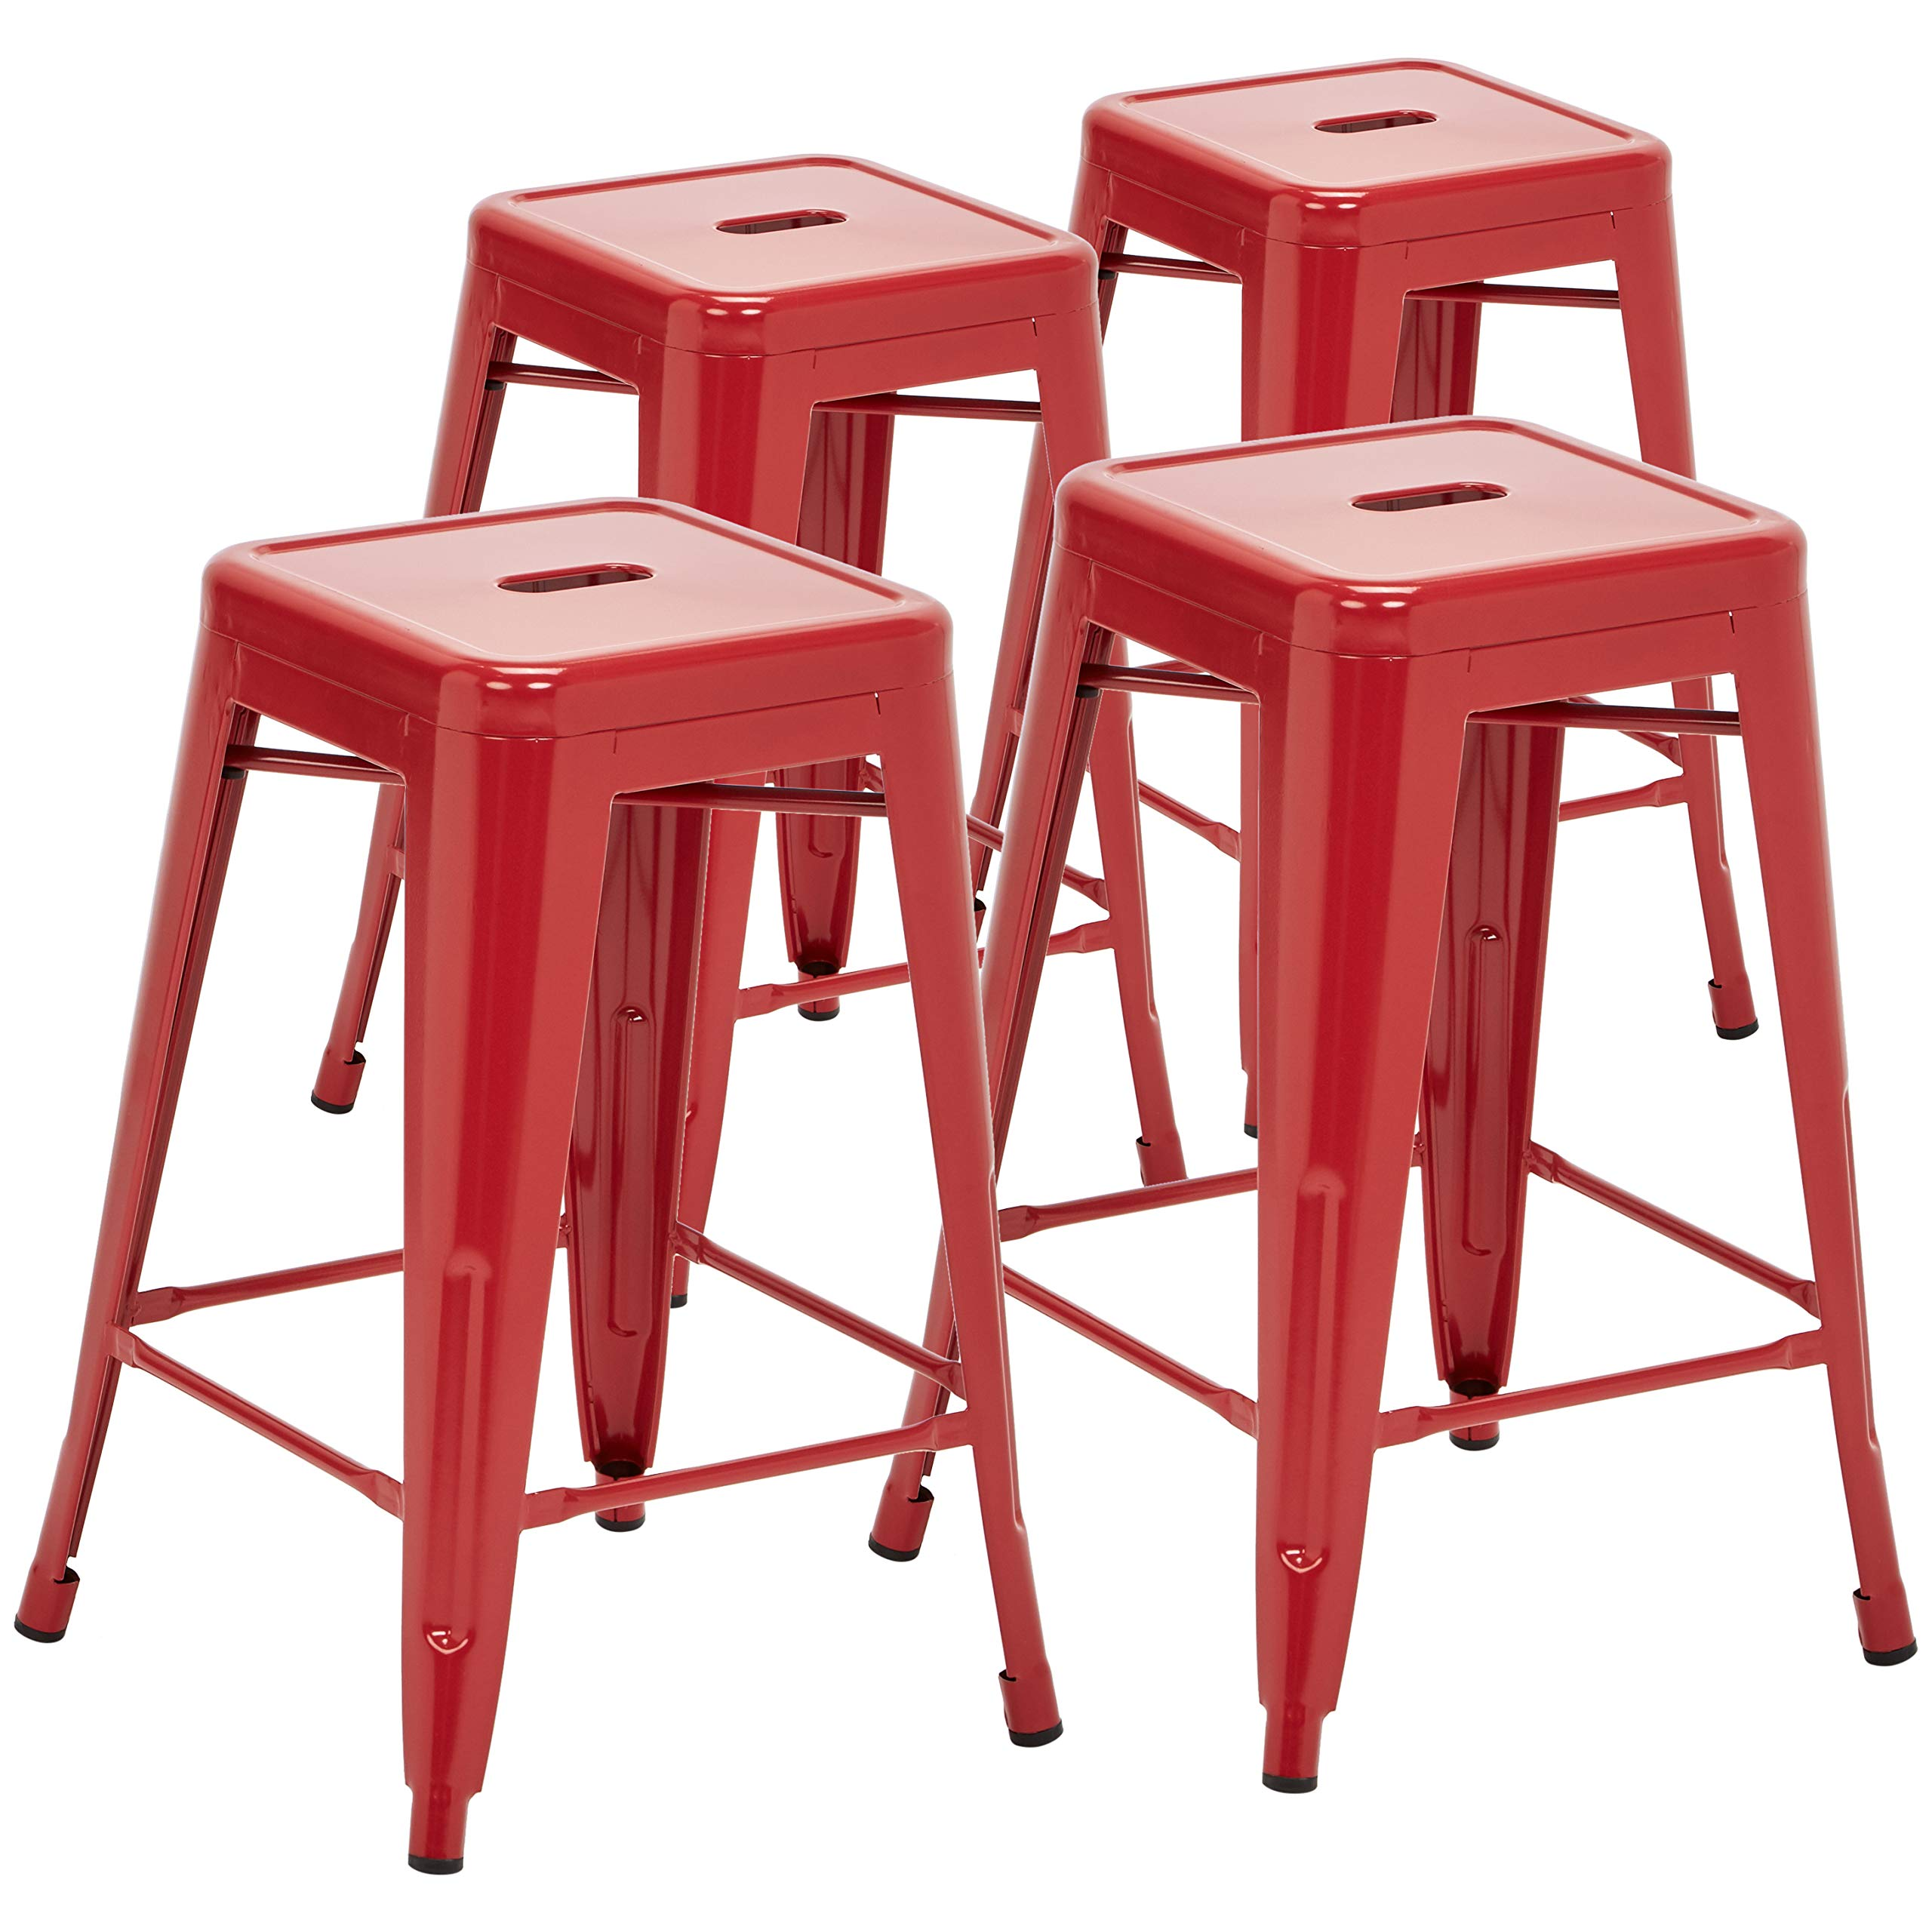 Prime Sprogs Tolix Style Square Metal Stool 12 H Orange Spg Lamtechconsult Wood Chair Design Ideas Lamtechconsultcom